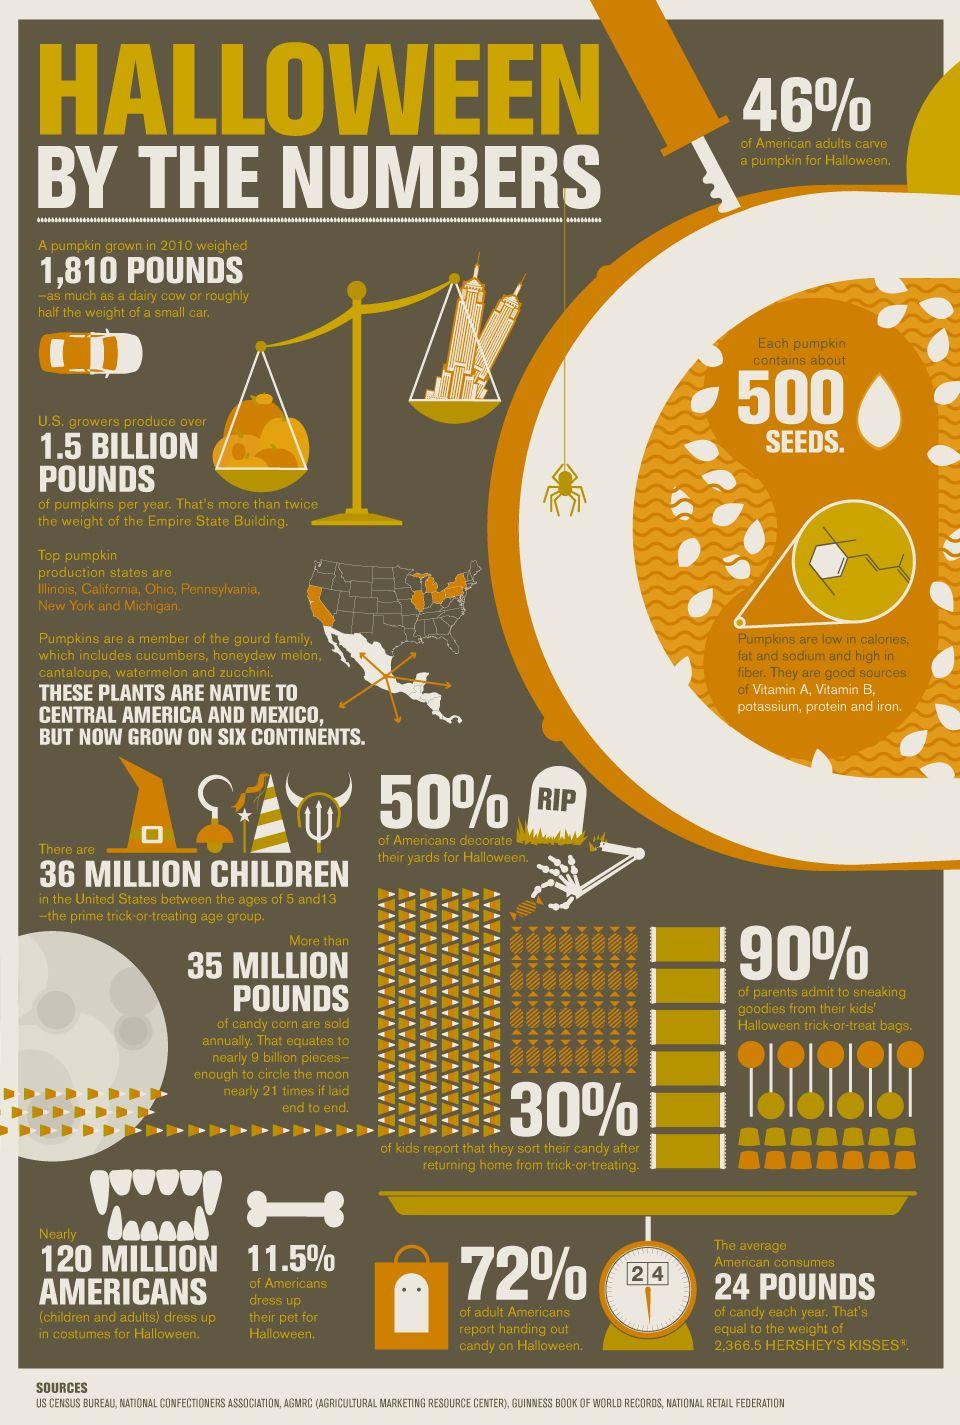 Halloween 2020 Facts Halloween 2020 | Halloween facts, Halloween infographic, Halloween